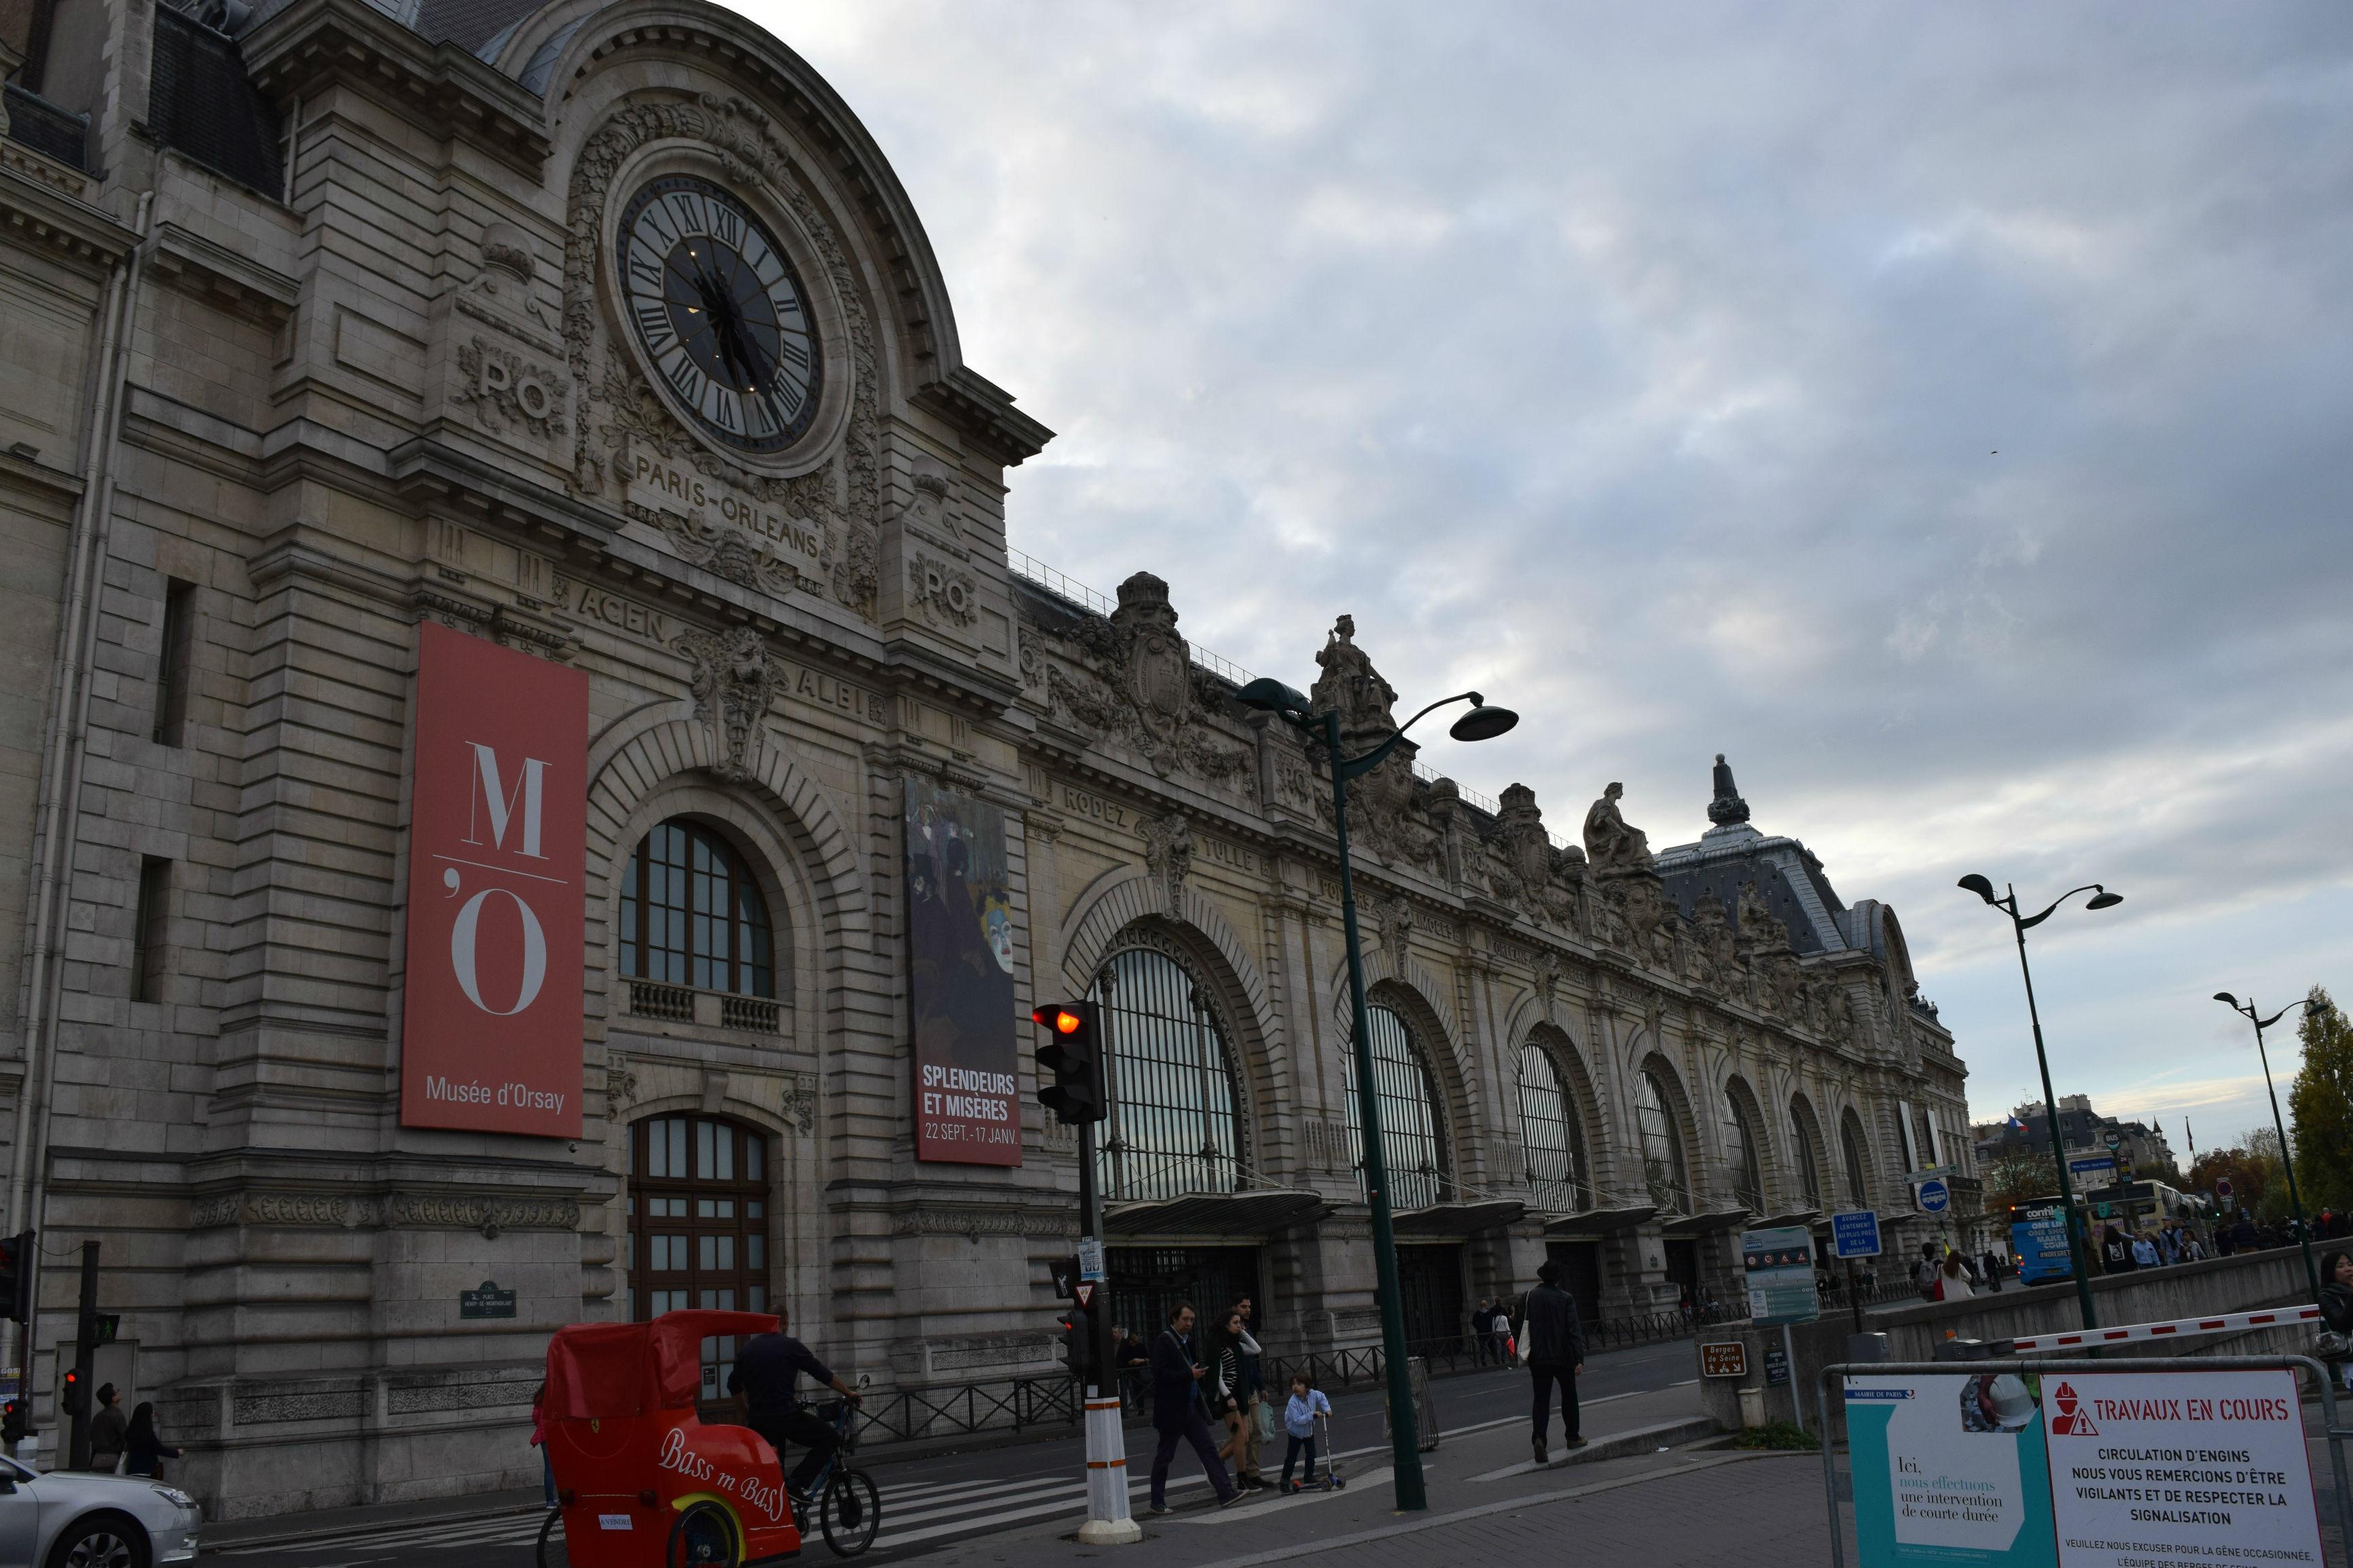 Paris, France - aspenseestheworld